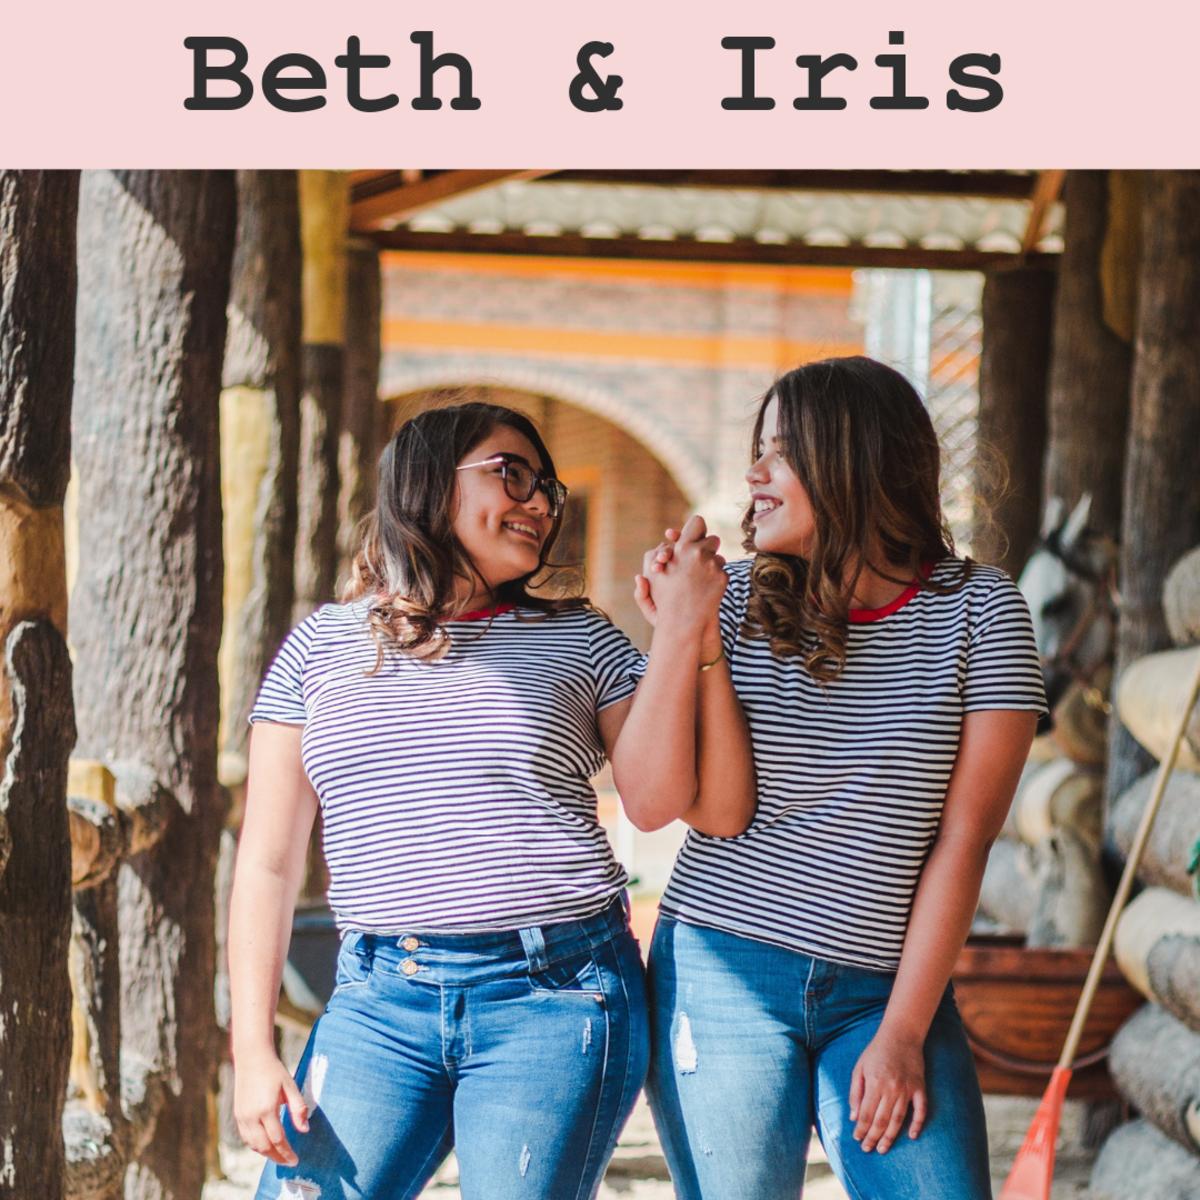 Beth & Iris